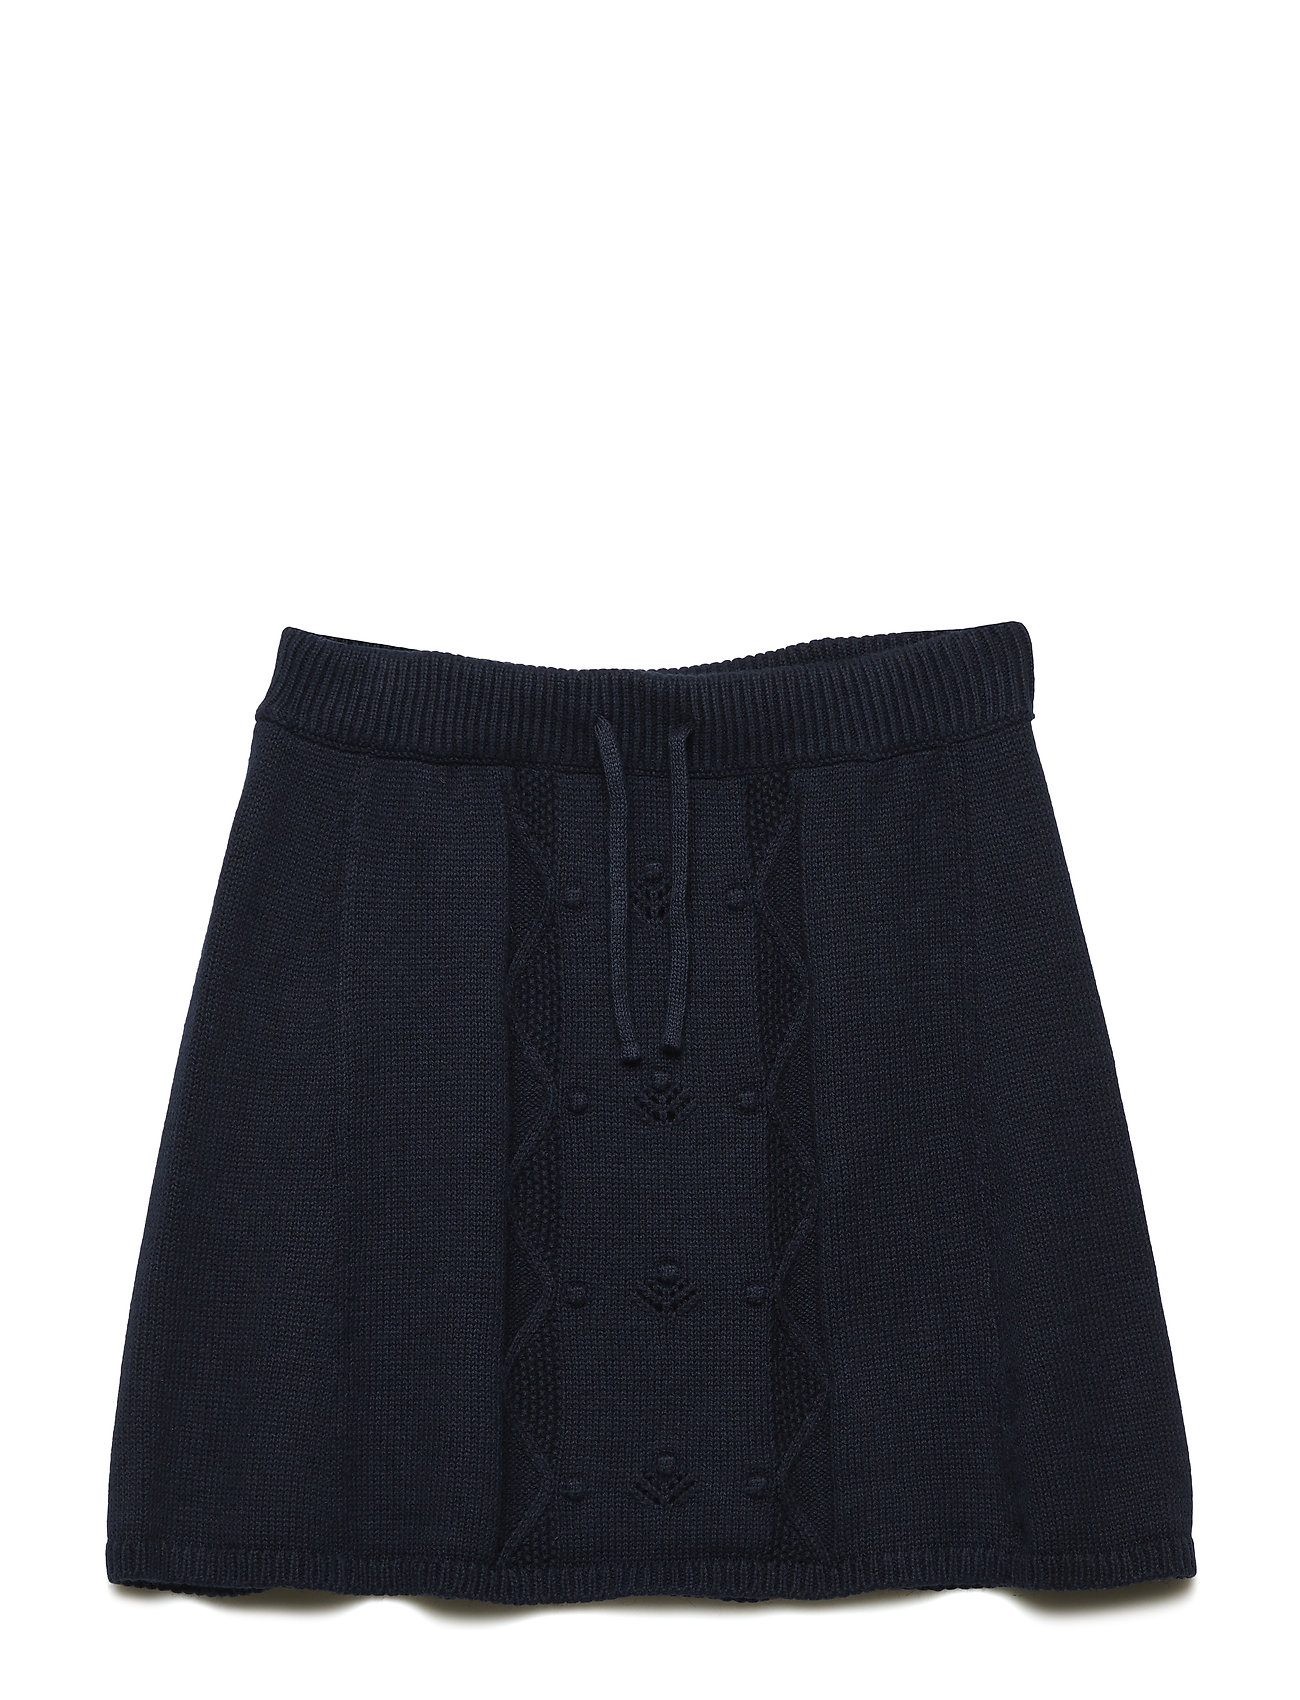 Mini A Ture Thilde Skirt, K - SKY CAPTAIN BLUE